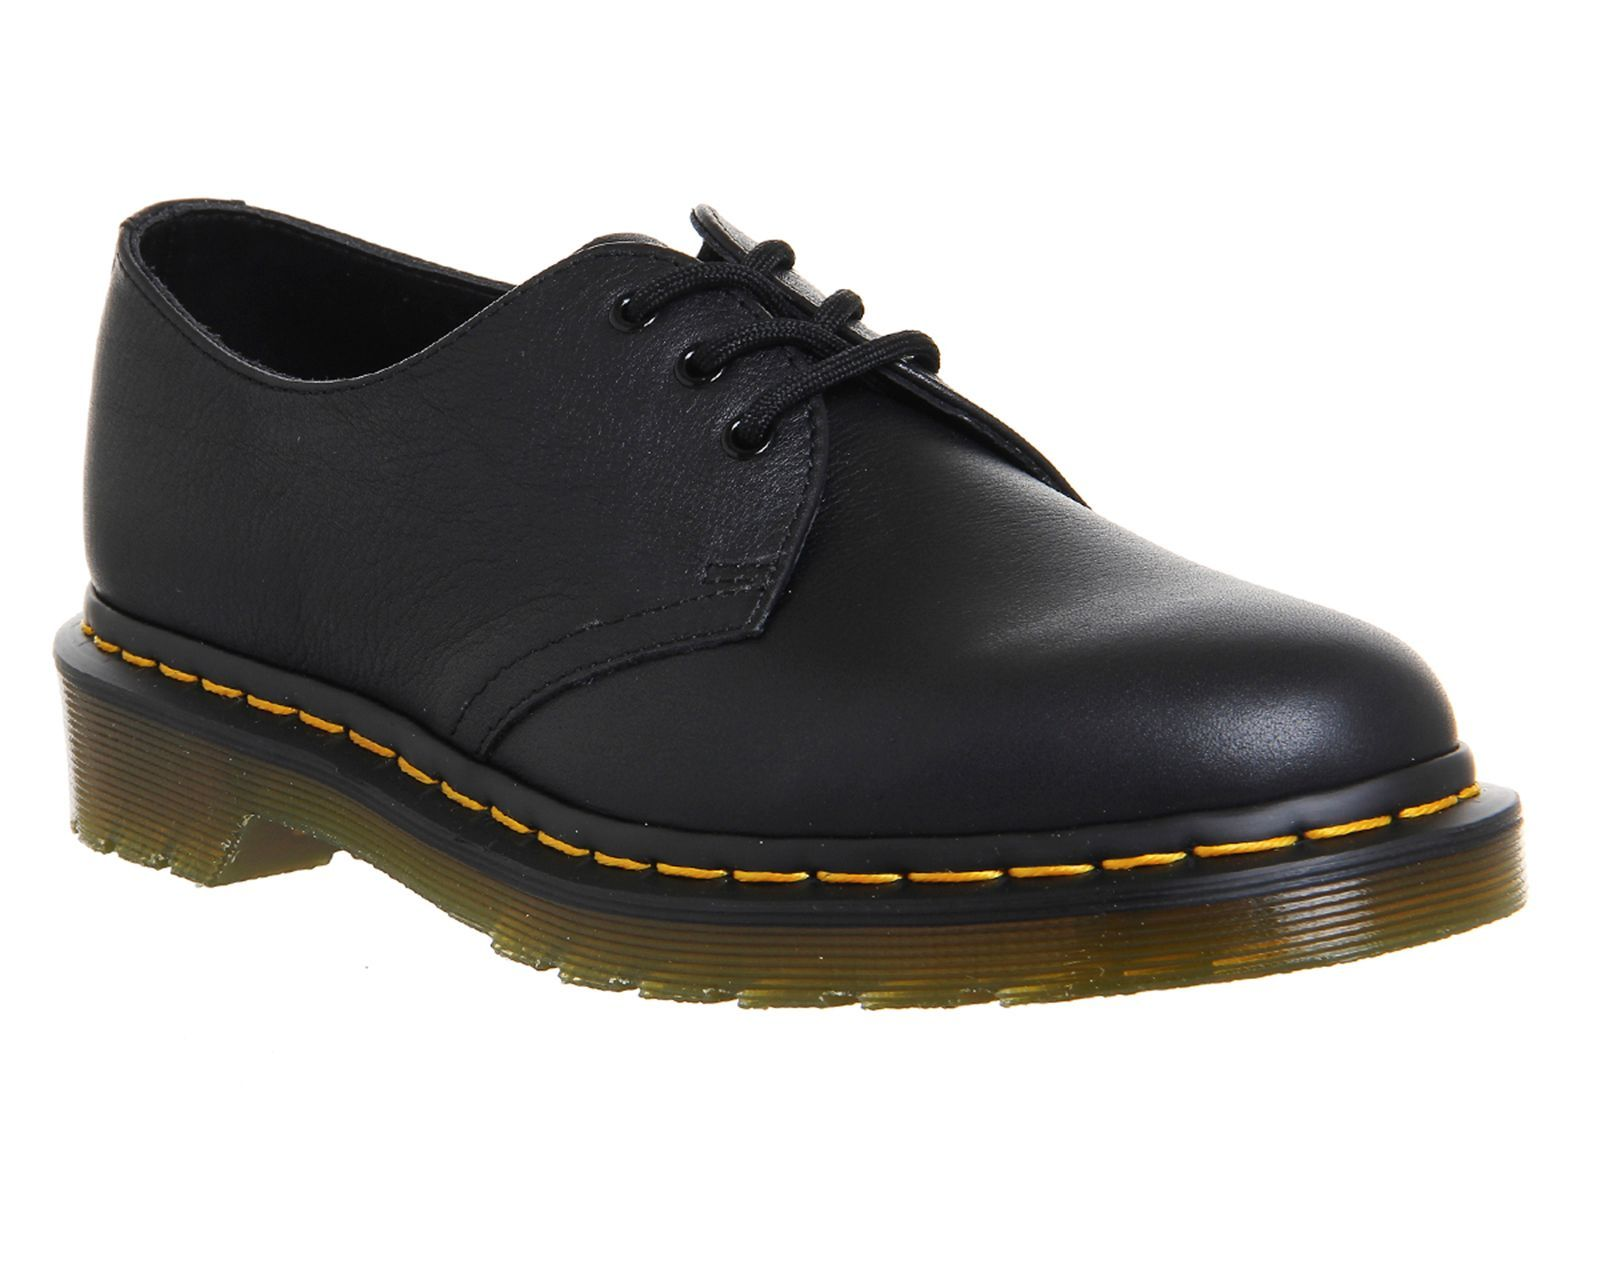 Dr martens 3 eyelet shoes black shoes shoes women